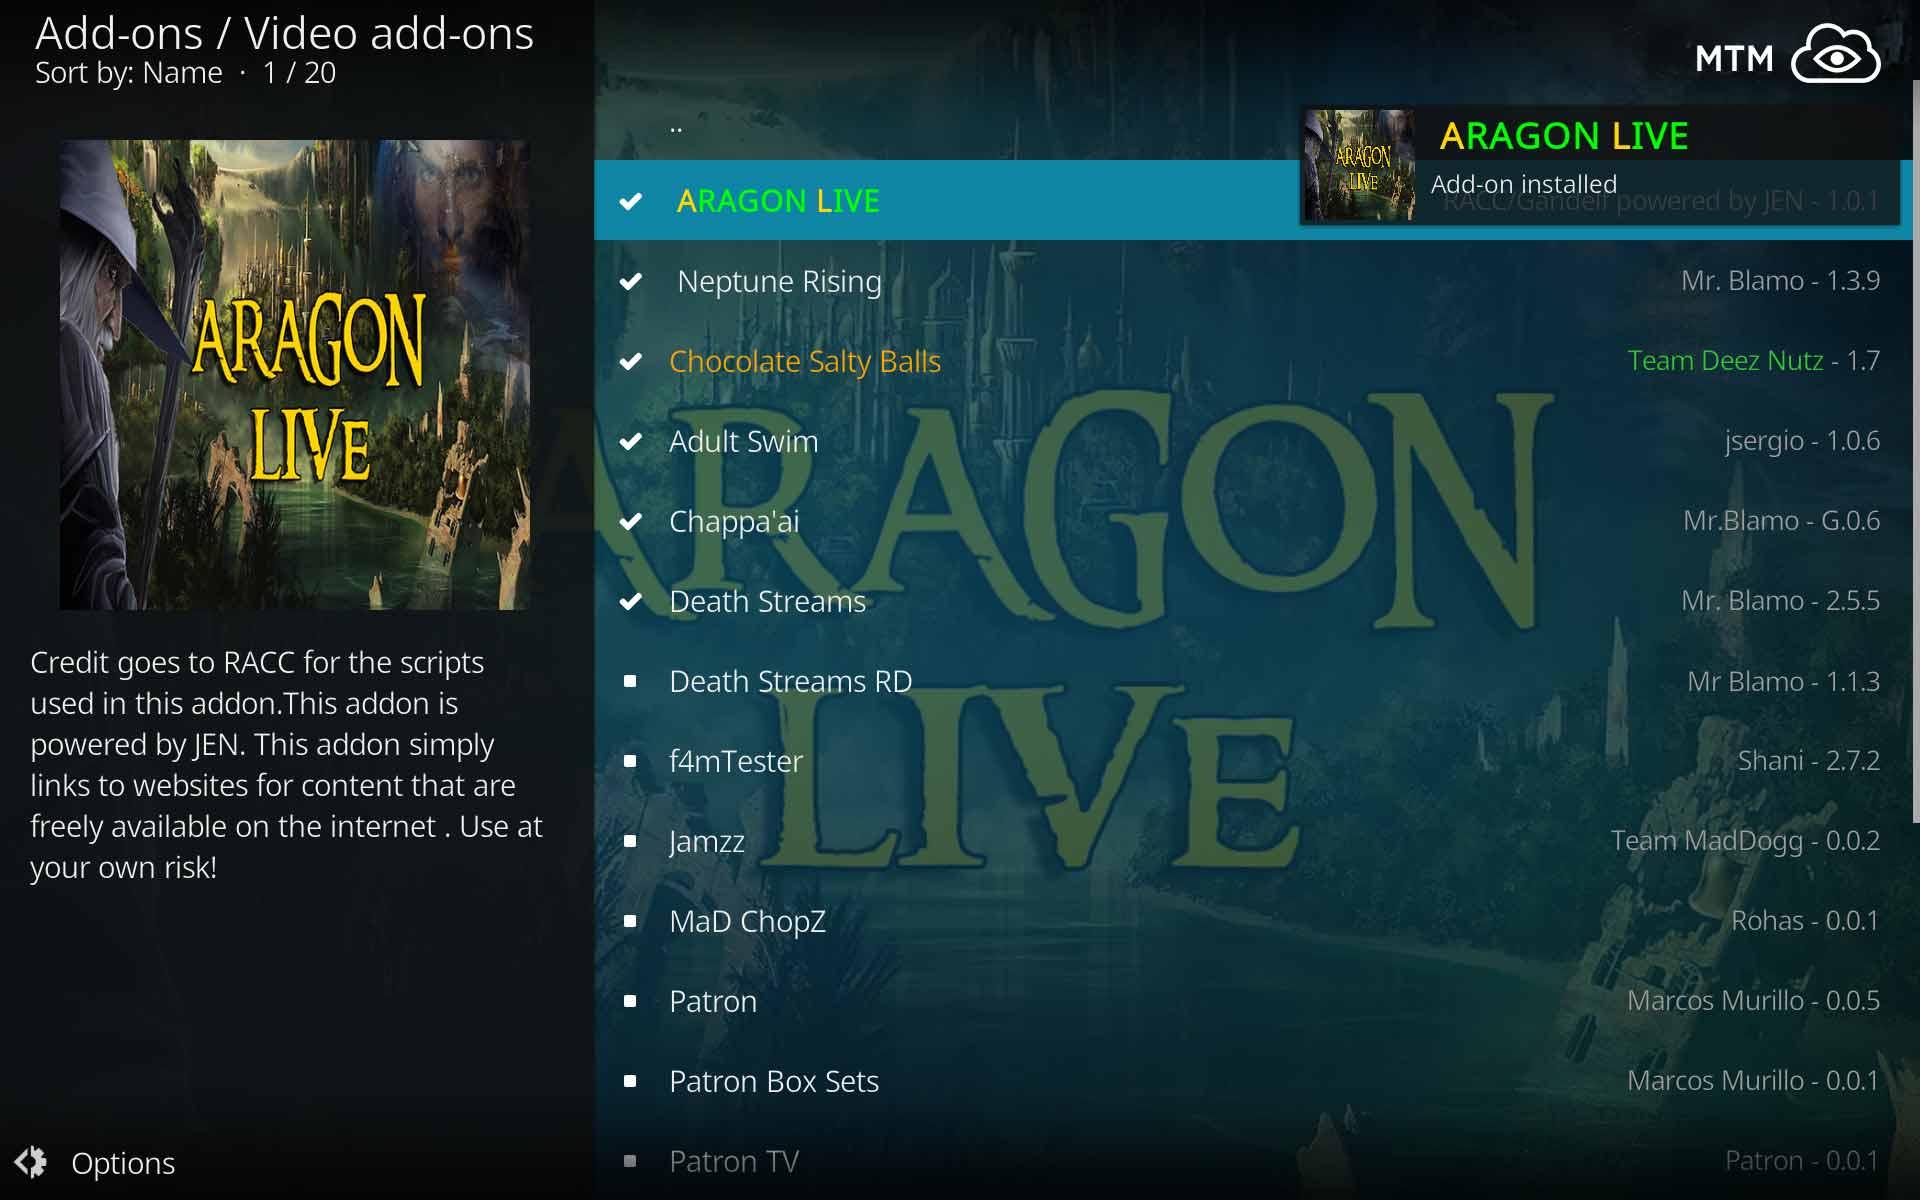 Aragon Live Streaming Video Free IPTV Kodi TV Addon | MTM